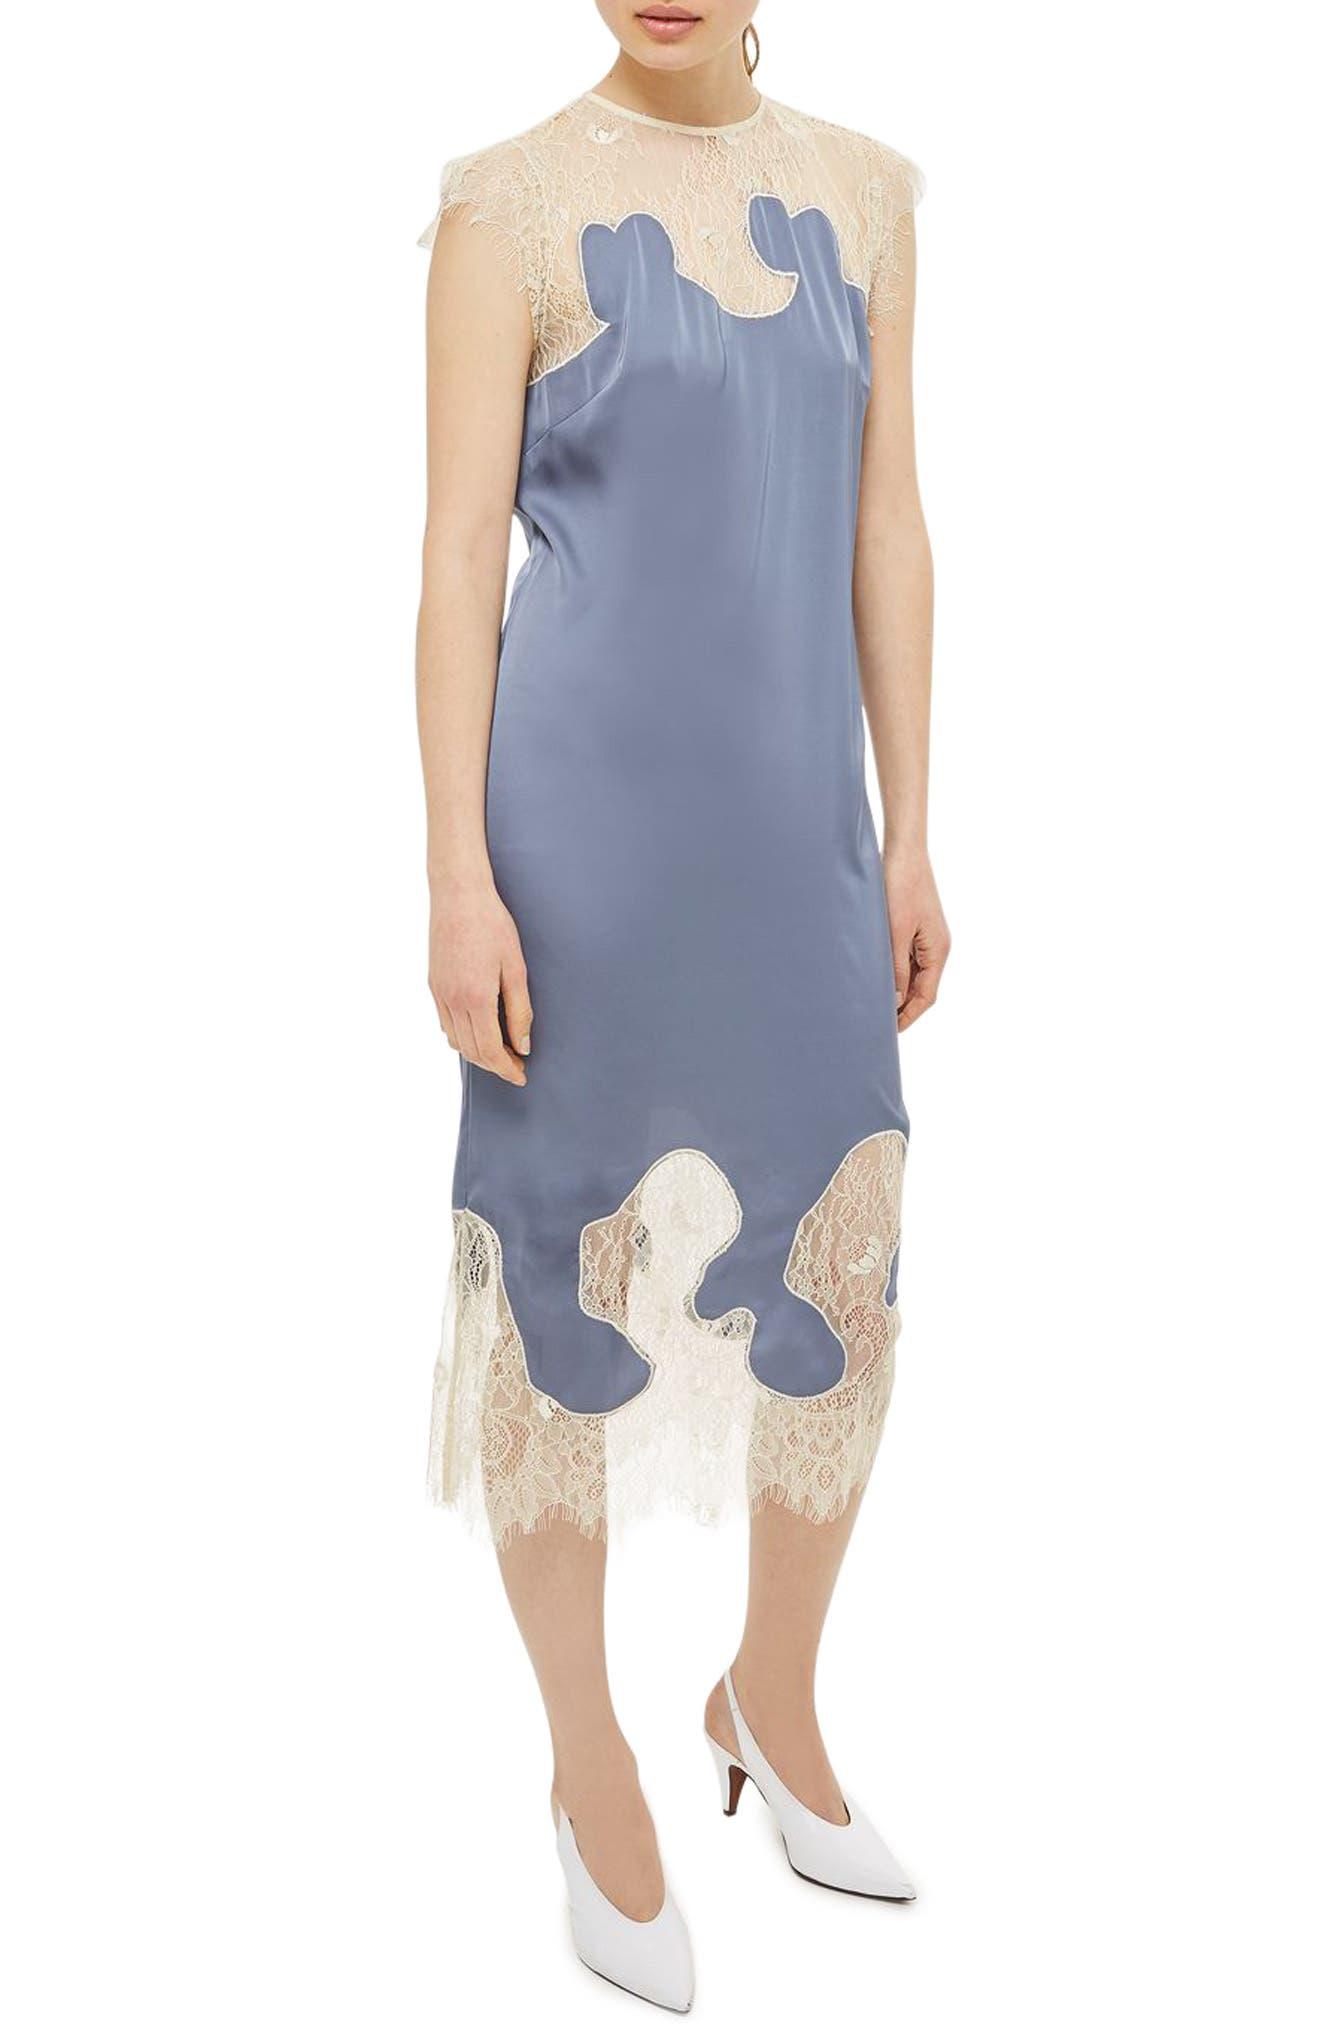 Alternate Image 1 Selected - Topshop Satin & Lace Midi Dress